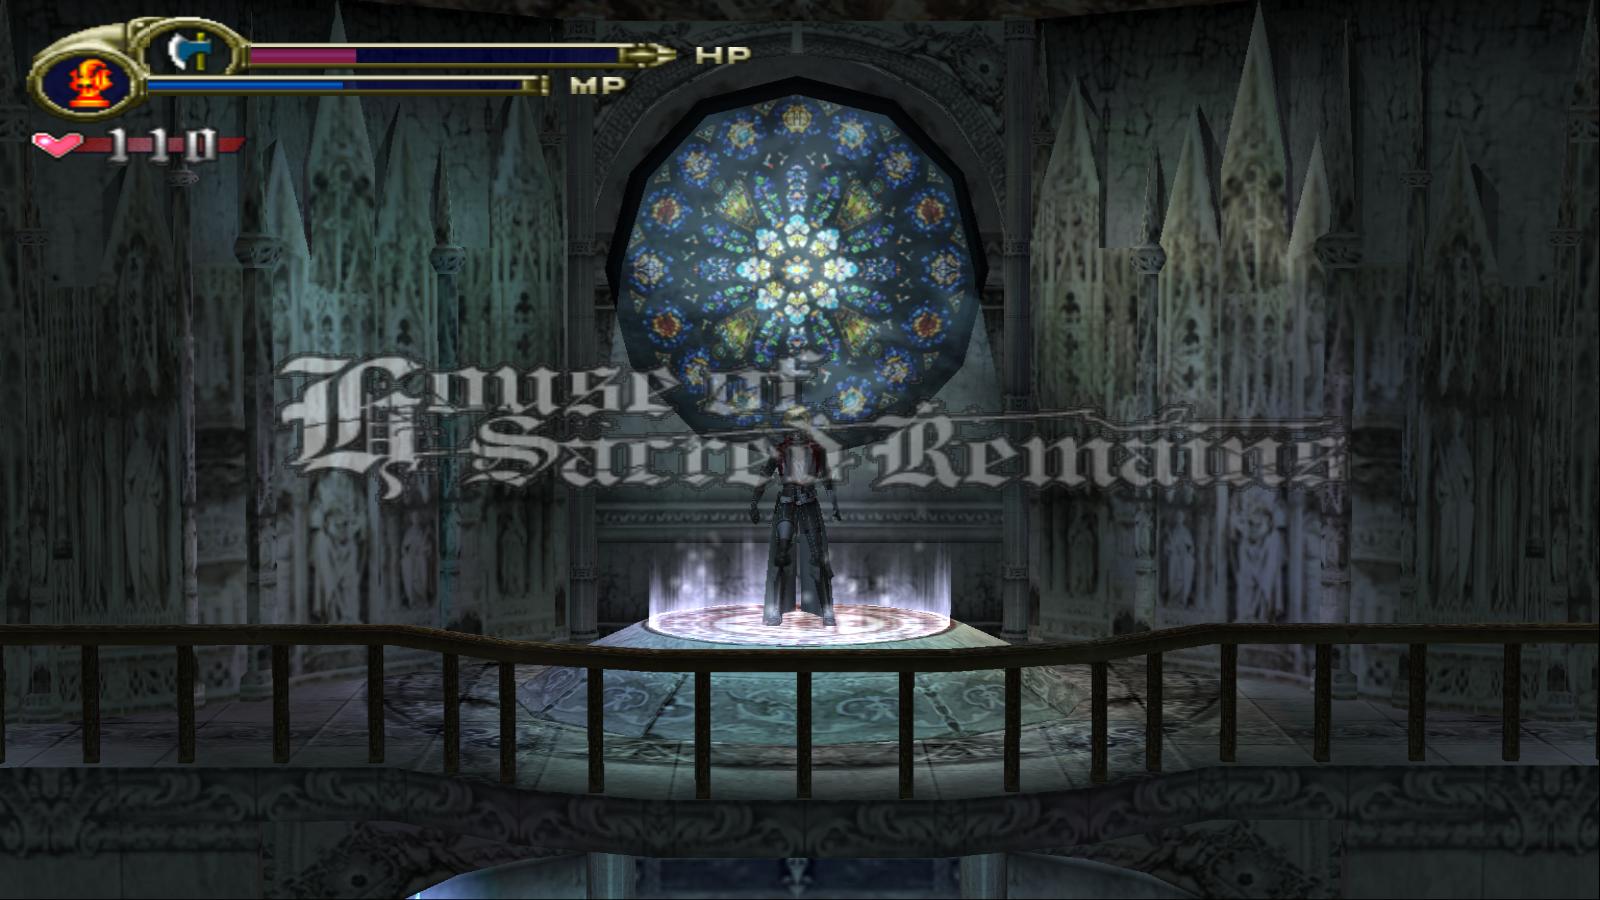 House Of Sacred Remains Castlevania Wiki Fandom